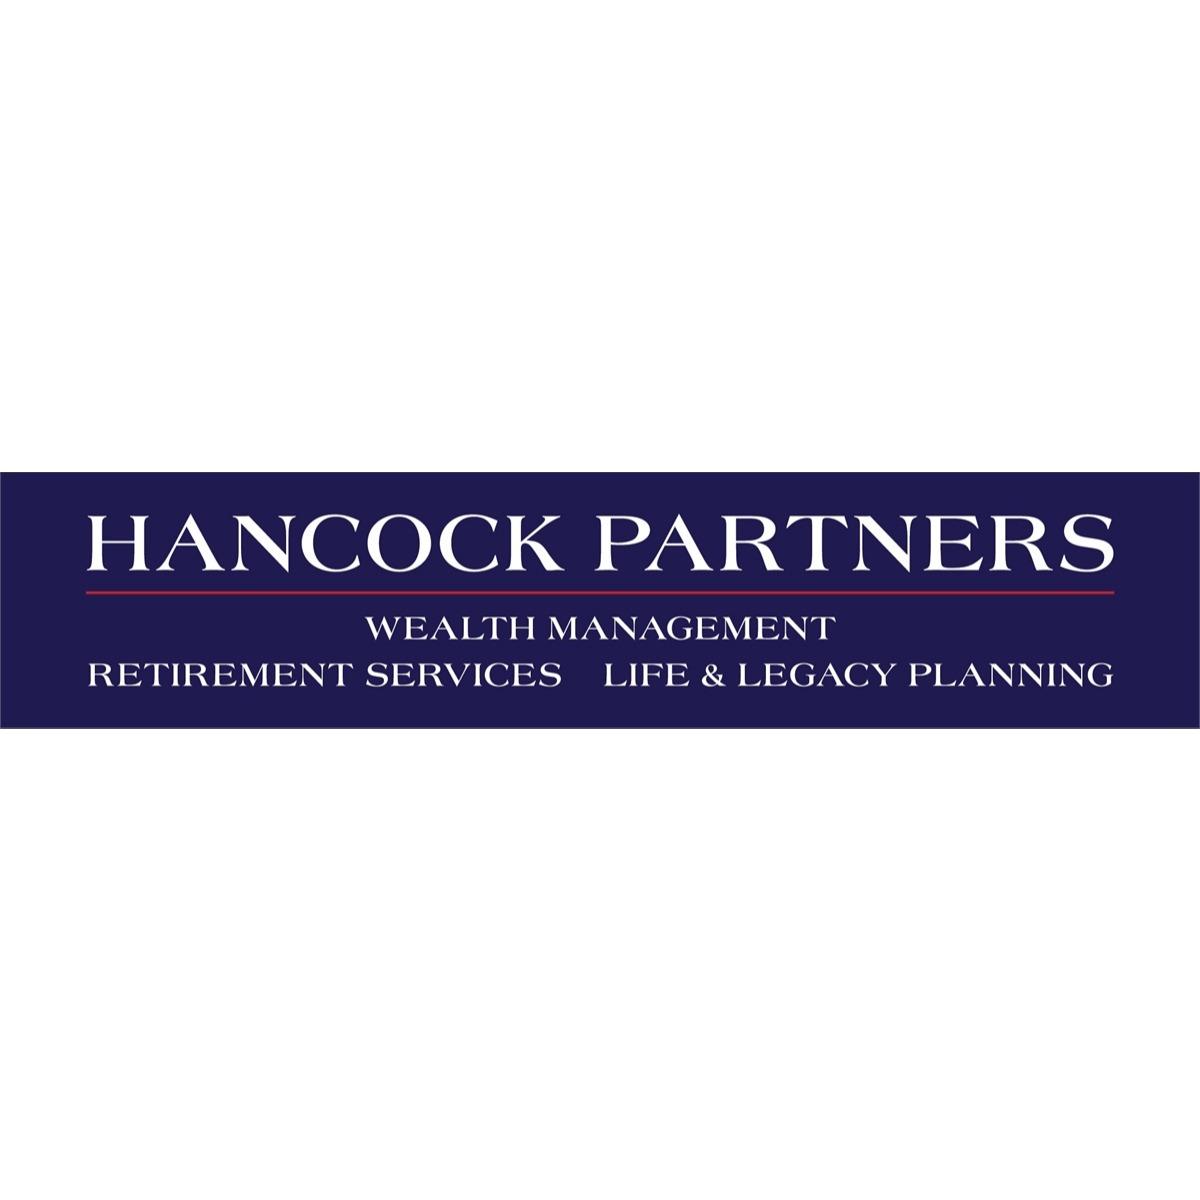 Hancock Partners